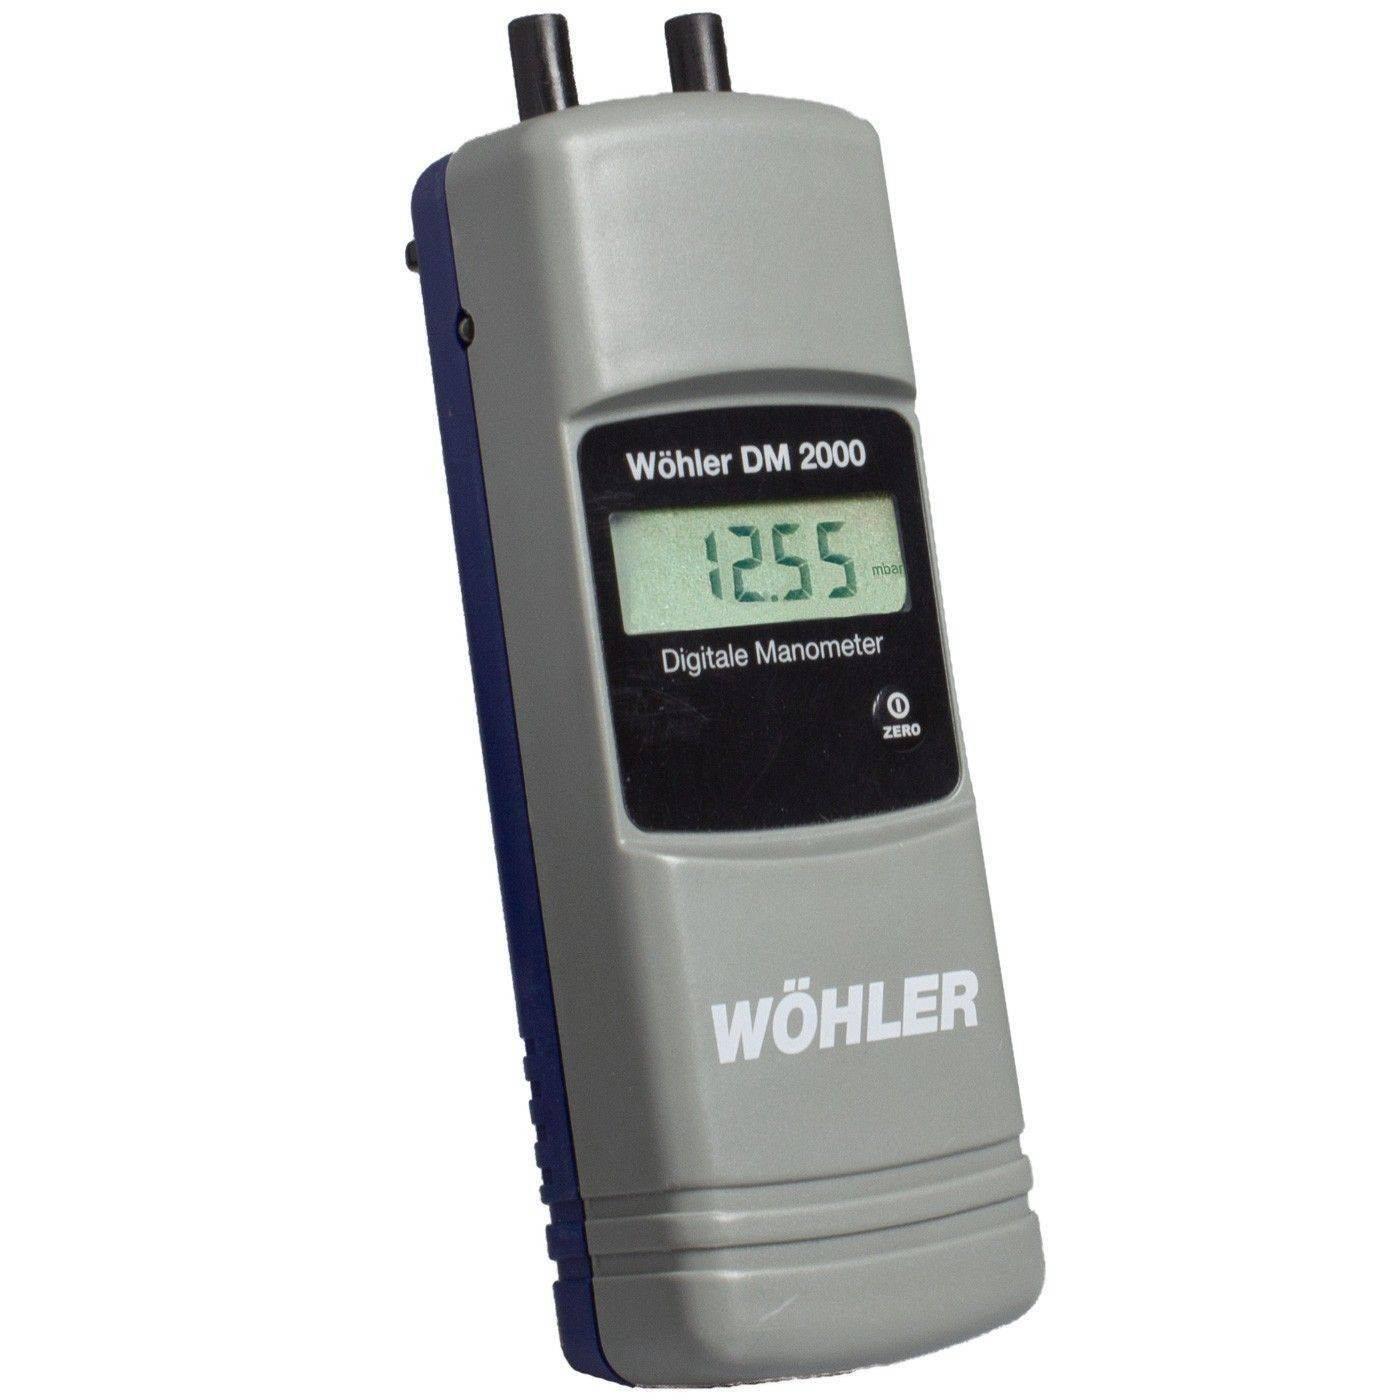 digital manometer. wohler dm 2000 digital manometer